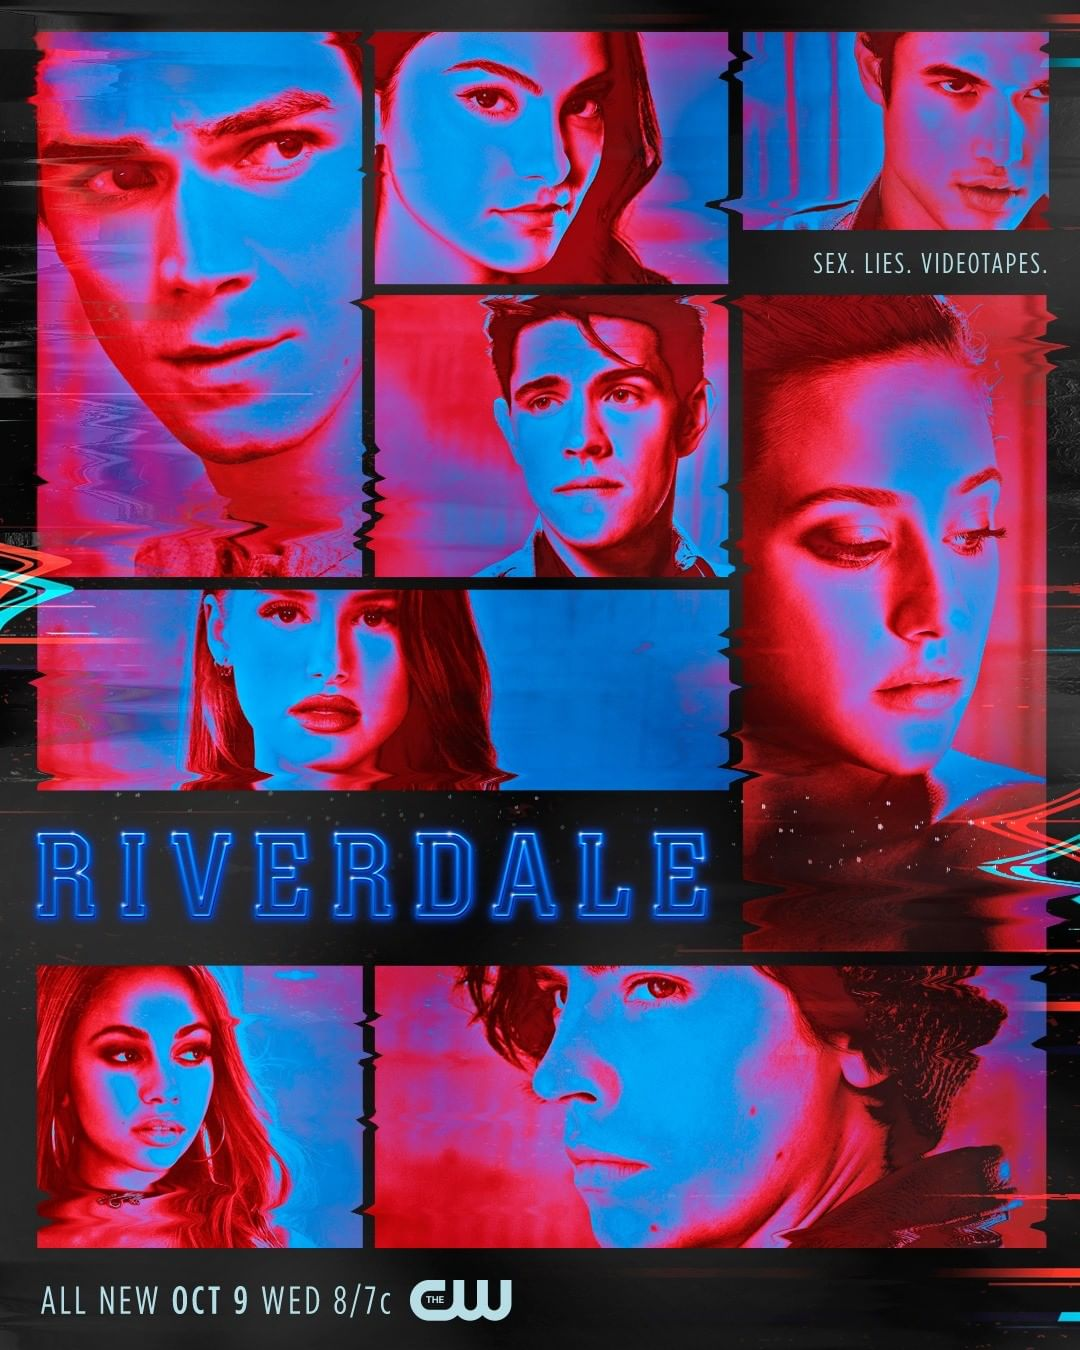 riverdale-poster-4-temporada